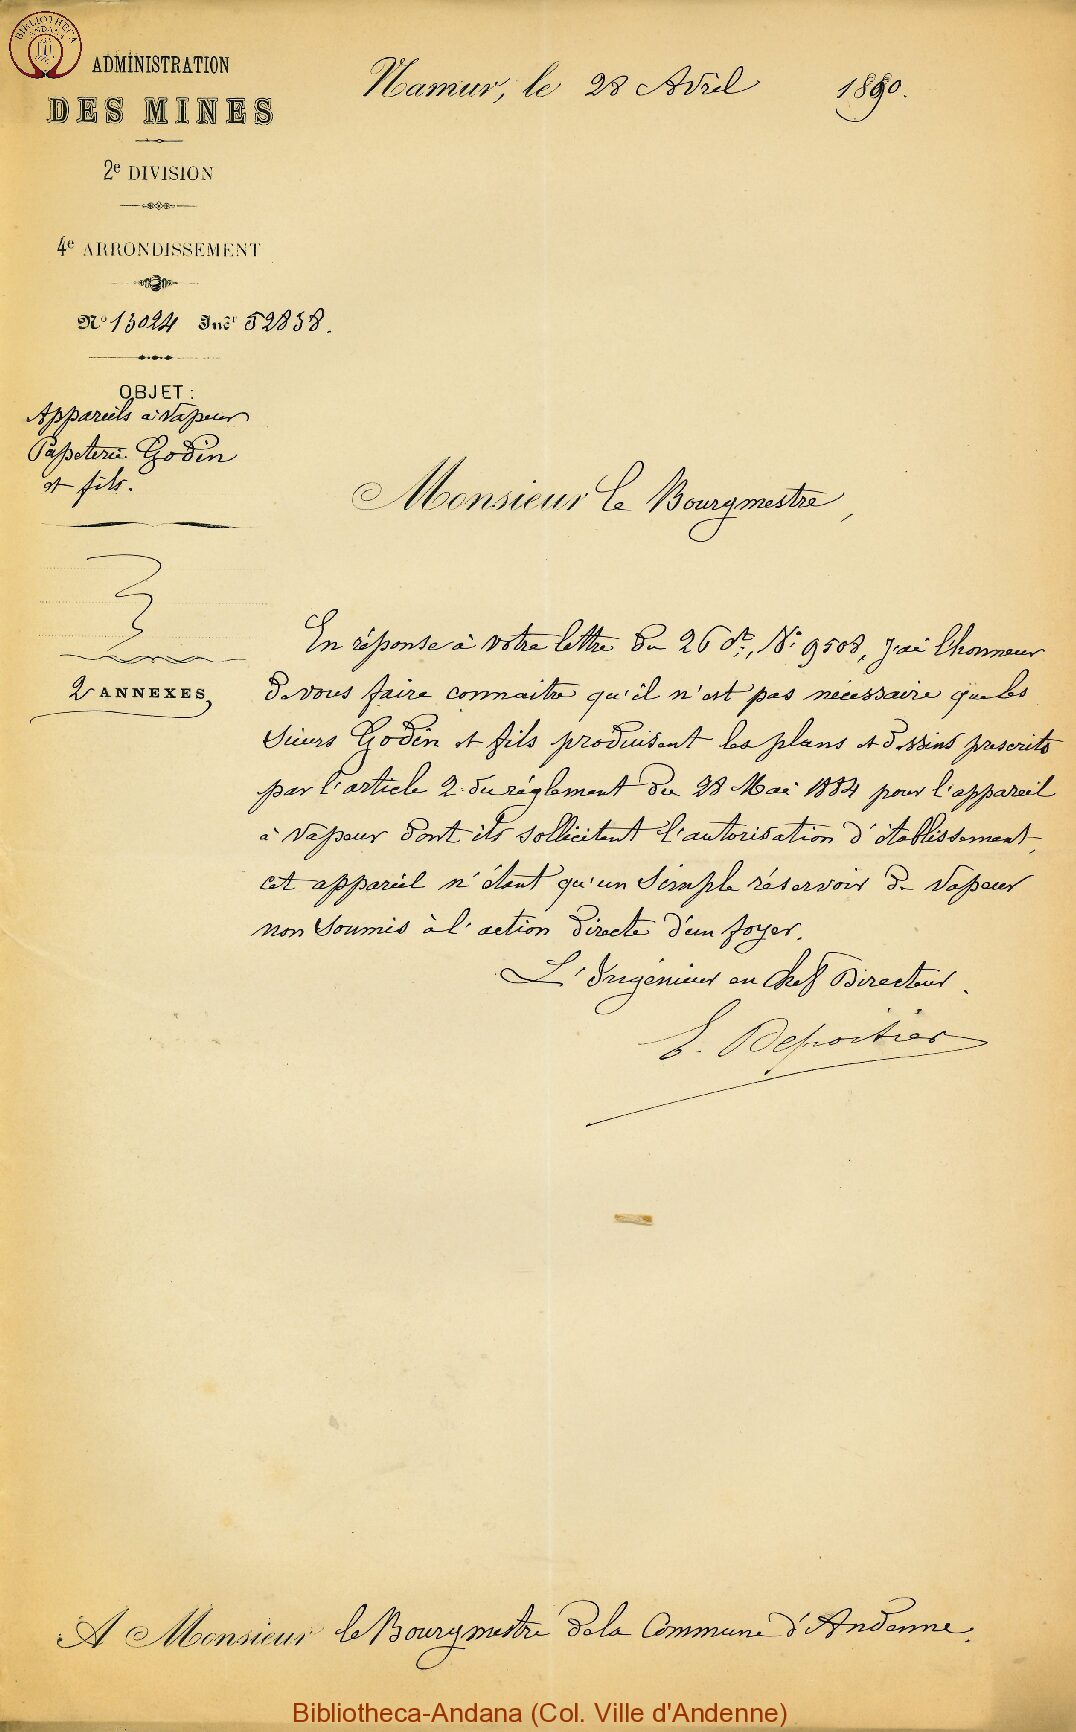 1890-04-28